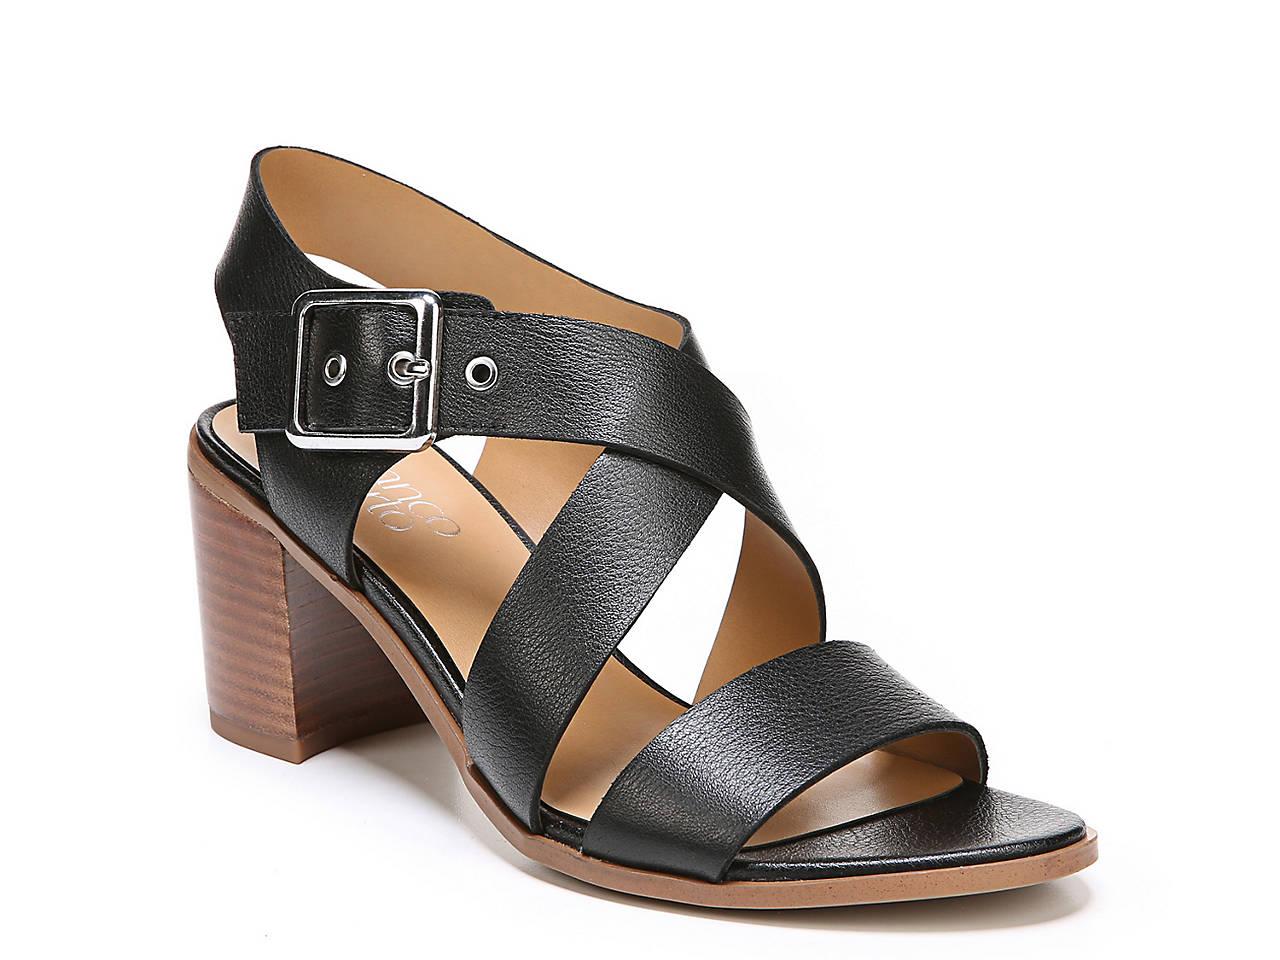 b74f0103a2 Franco Sarto Helga Sandal Women s Shoes